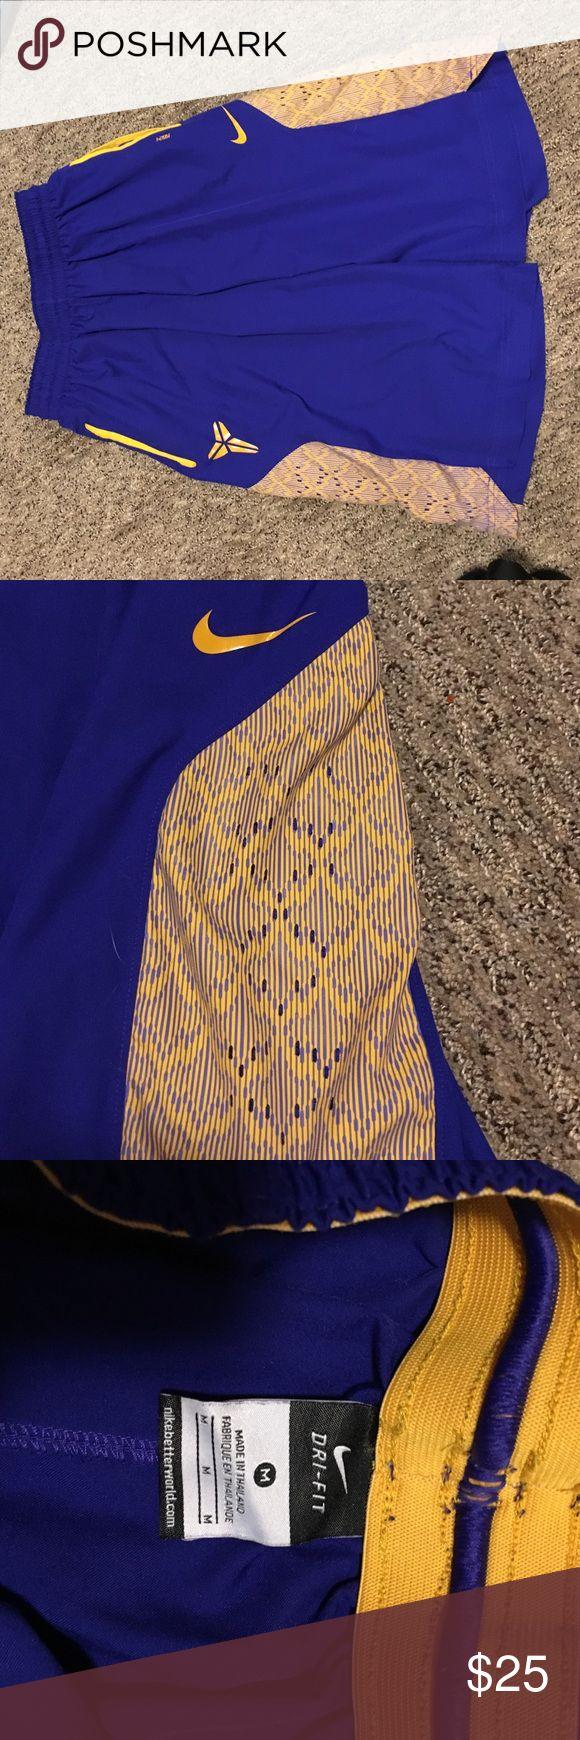 Nike Kobe Bryant basketball shorts Purplish blue and yellow light weight dri-fit basketball shorts good condition Nike Shorts Athletic